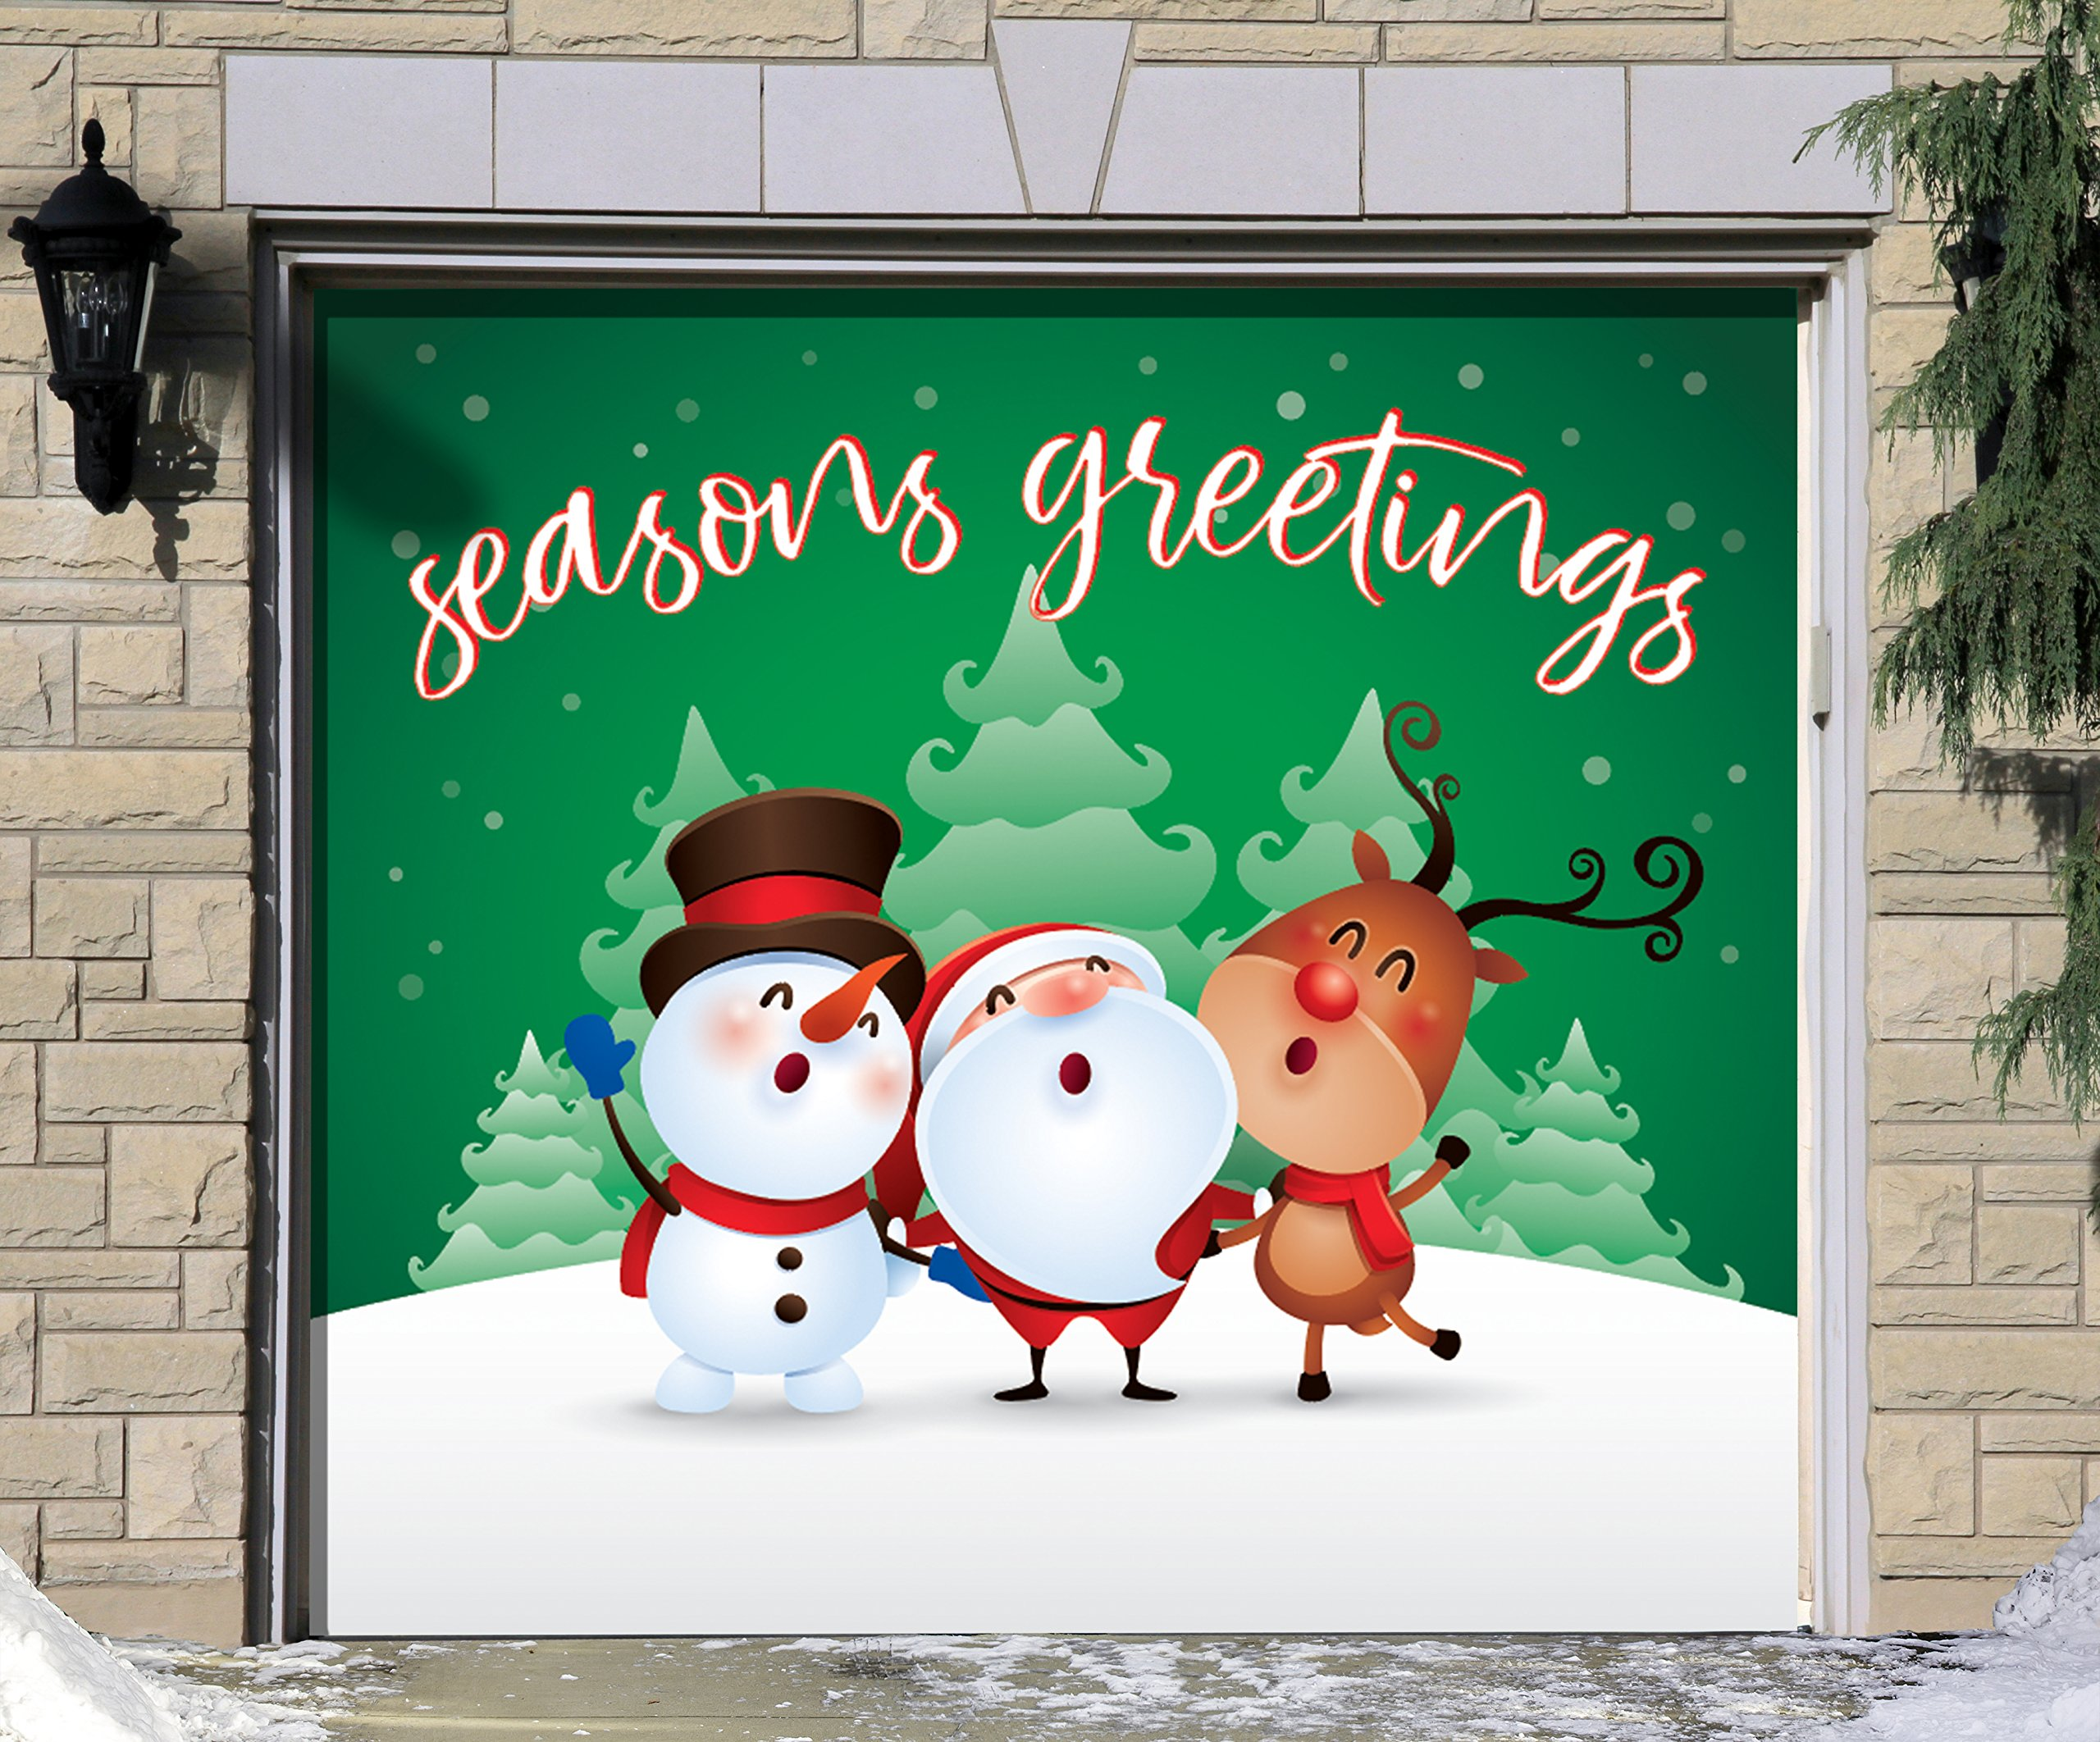 Outdoor Christmas Holiday Garage Door Banner Cover Mural Décoration - Christmas Characters Seasons Greetings Winter - Outdoor Christmas Holiday Garage Door Banner Décor Sign 7'x8'